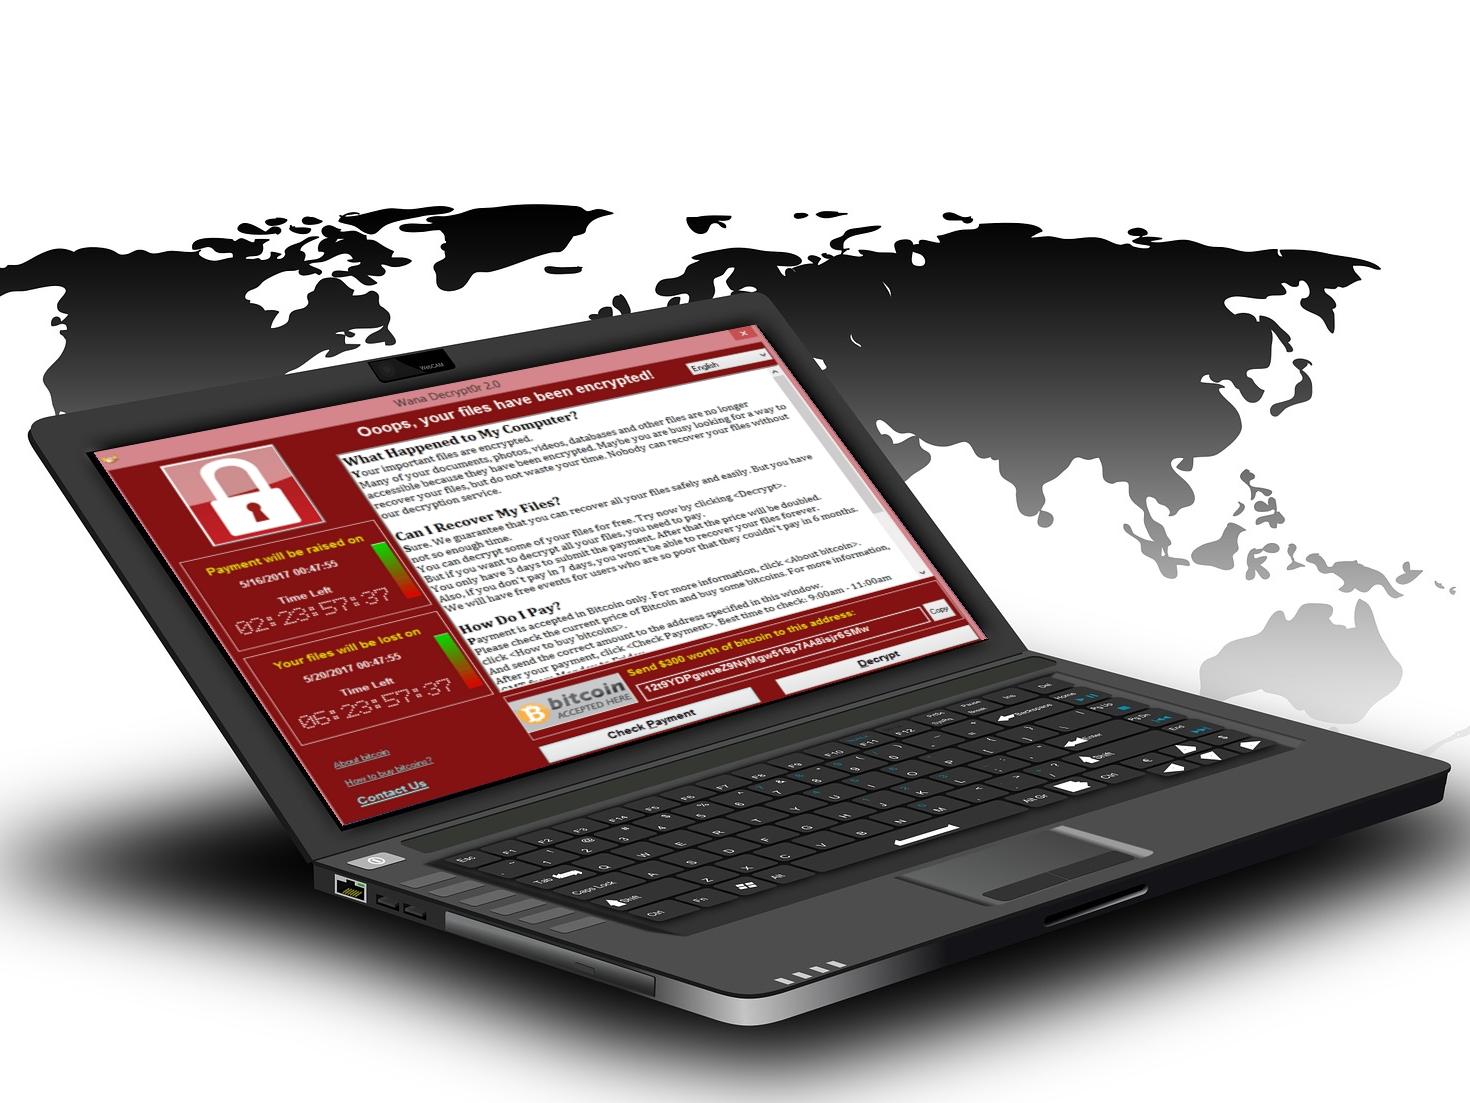 AxiGuard Stops Ransomware Virus